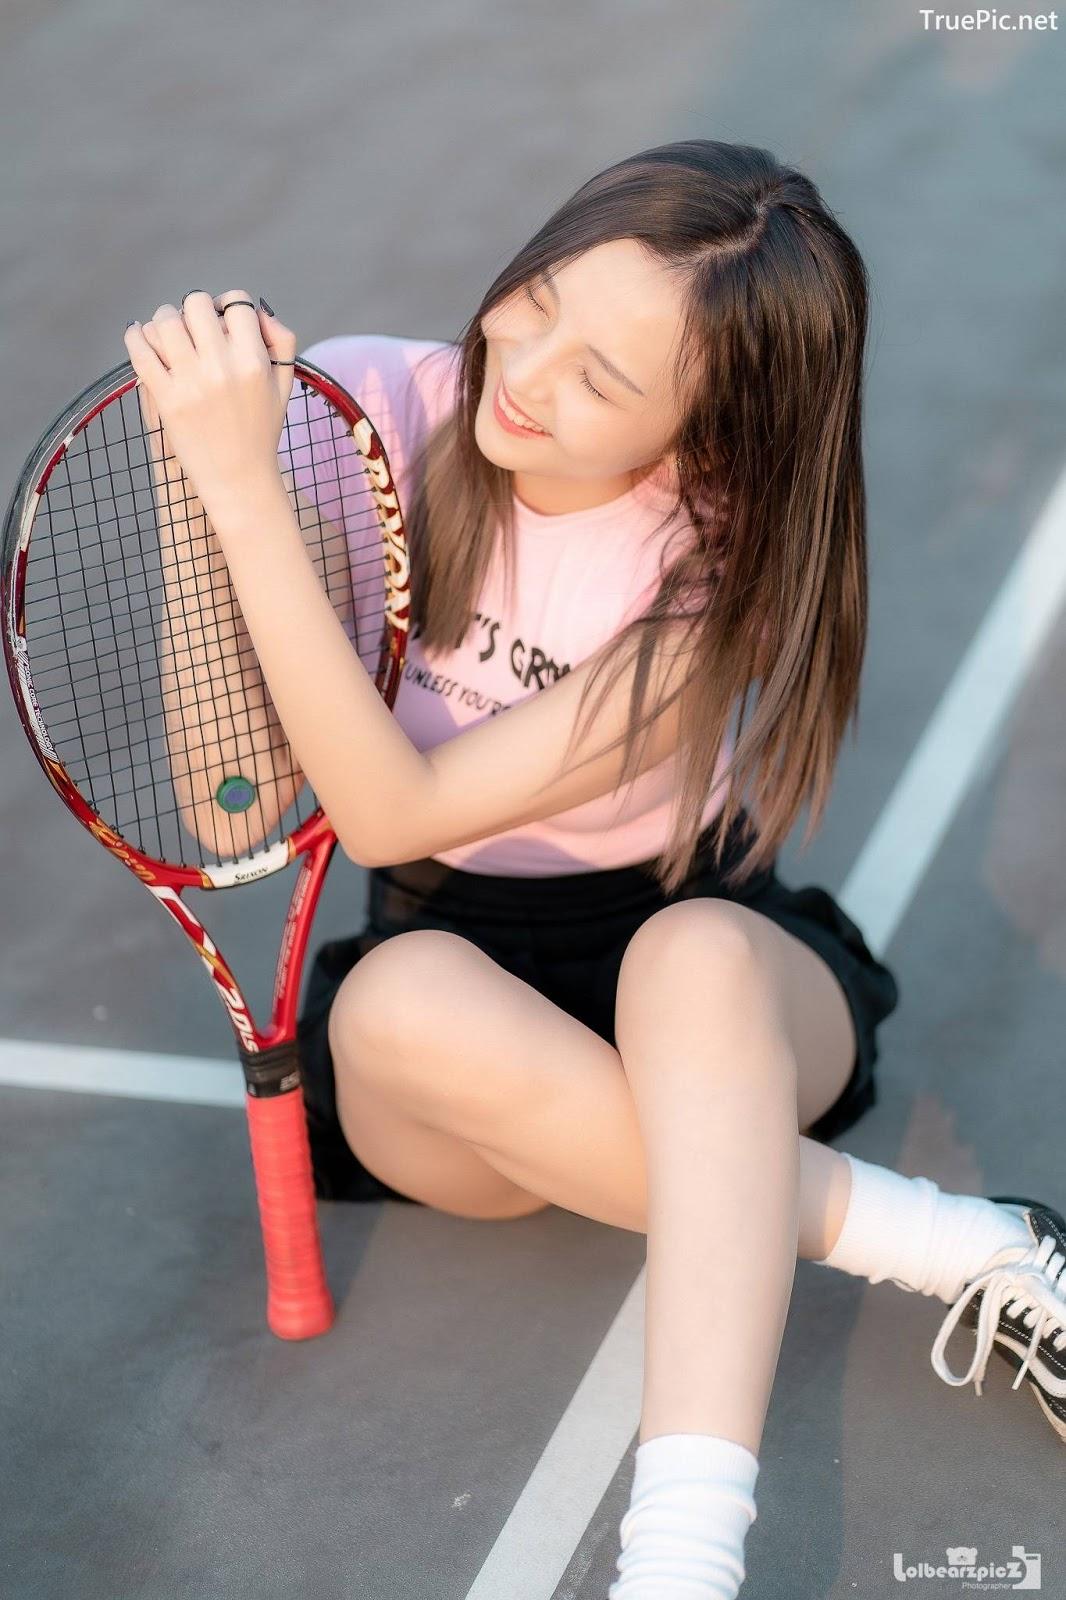 Image Thailand Model - Pattanan Truengjitrarat - Cute Sports Girl - TruePic.net - Picture-8